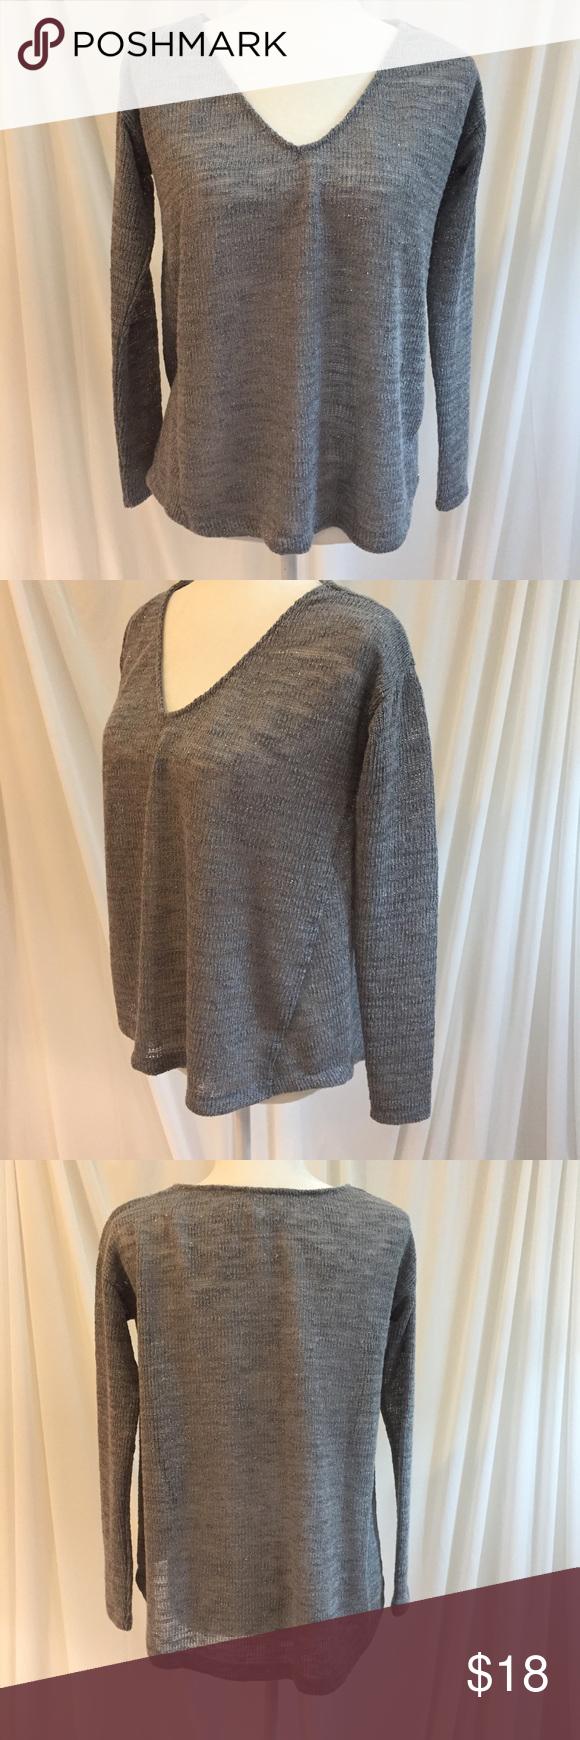 Aeropostale Silver & Grey Sweater | Aeropostale and Flaws